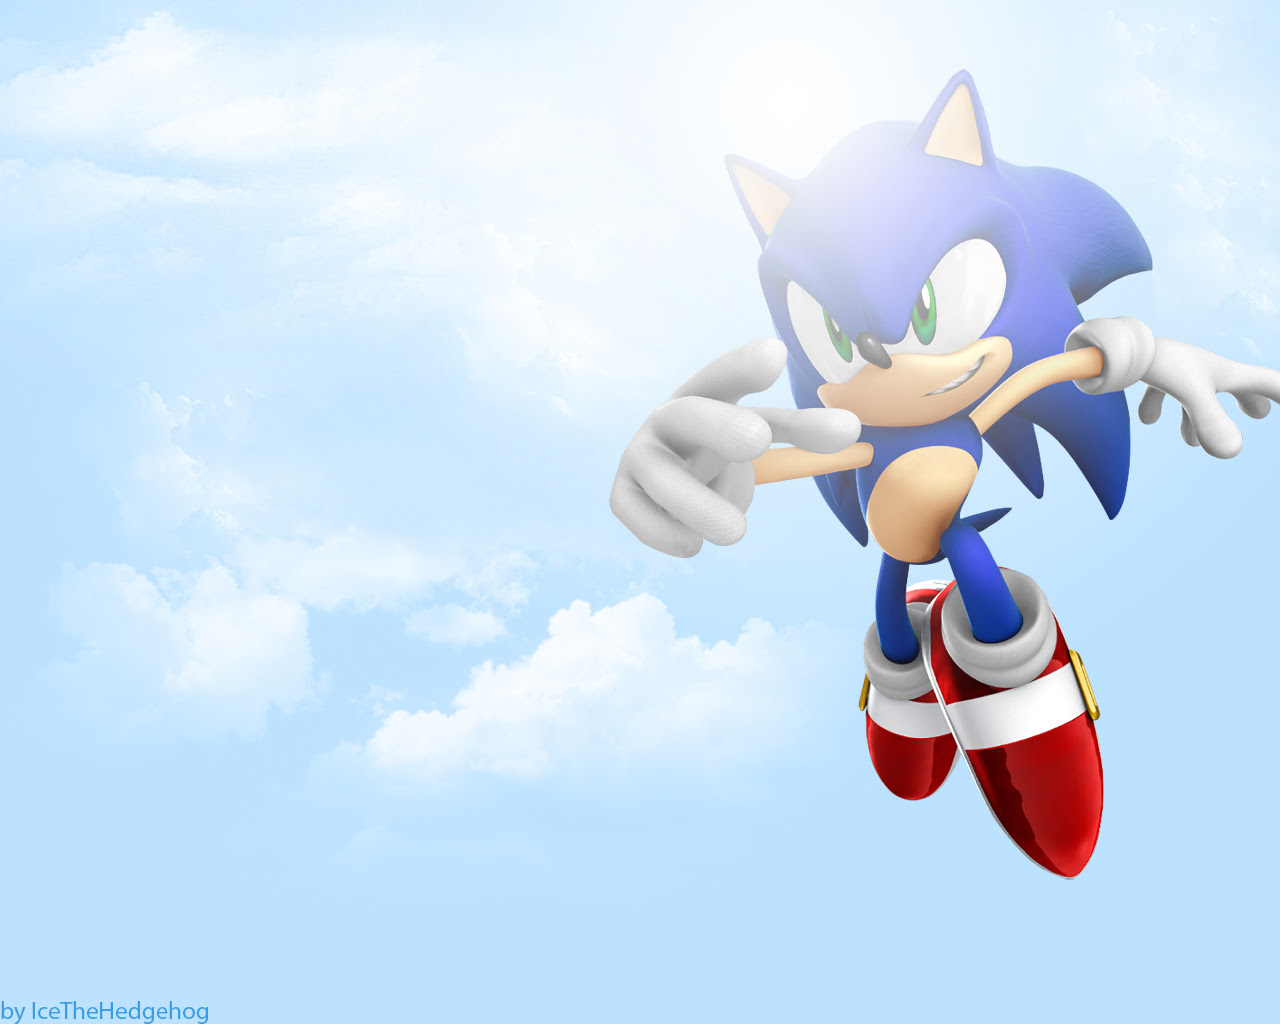 Sonic In The Sky Sonic The Hedgehog Wallpaper 8842315 Fanpop